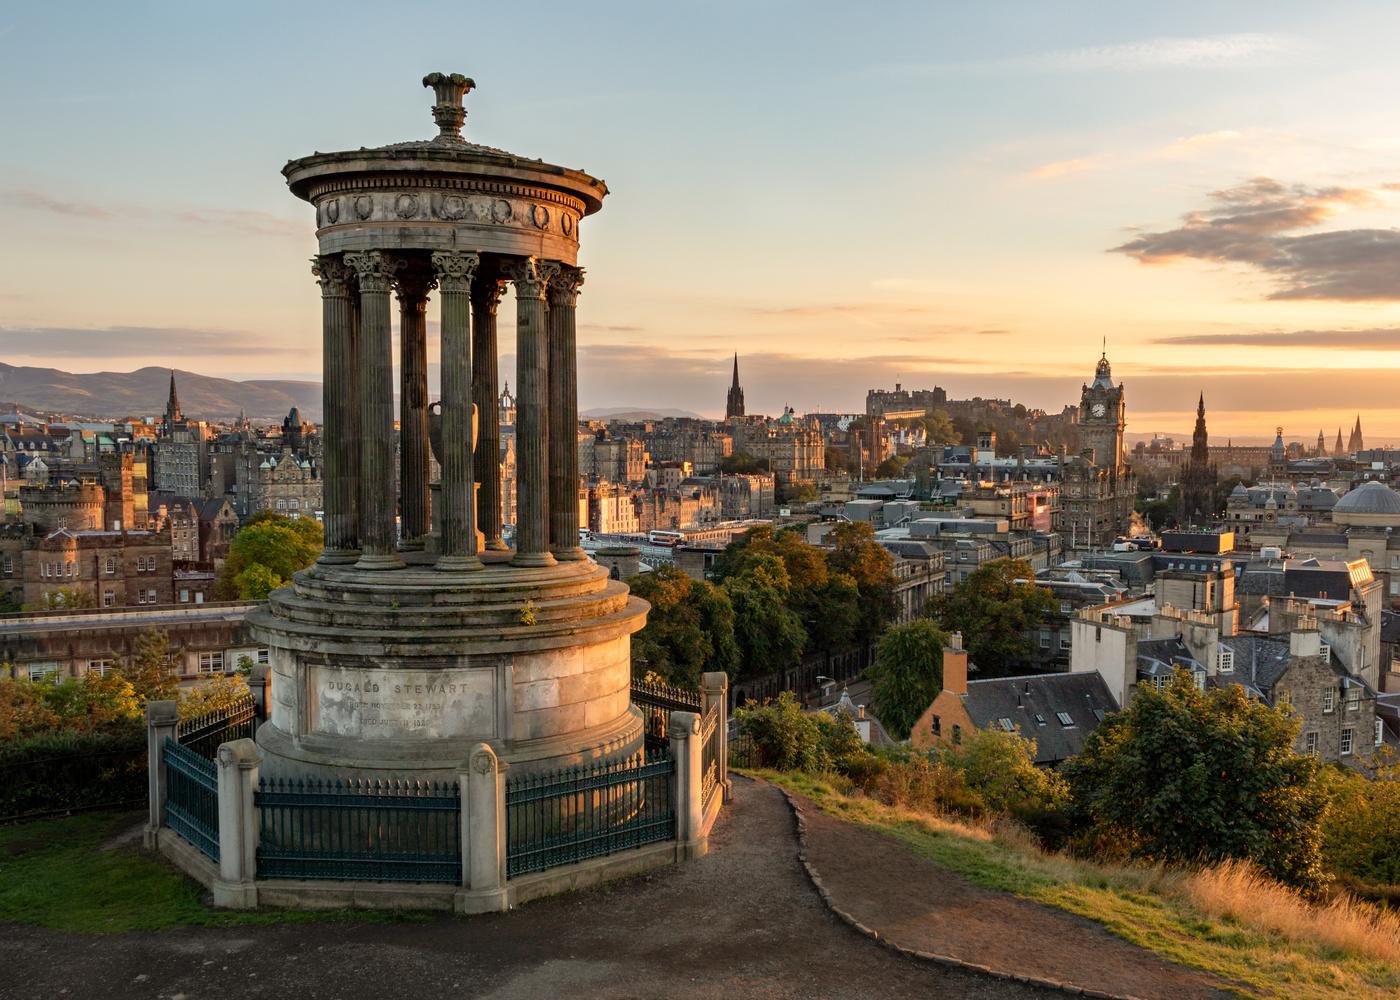 Calton Hill Edinburgh by Rick Bekendam